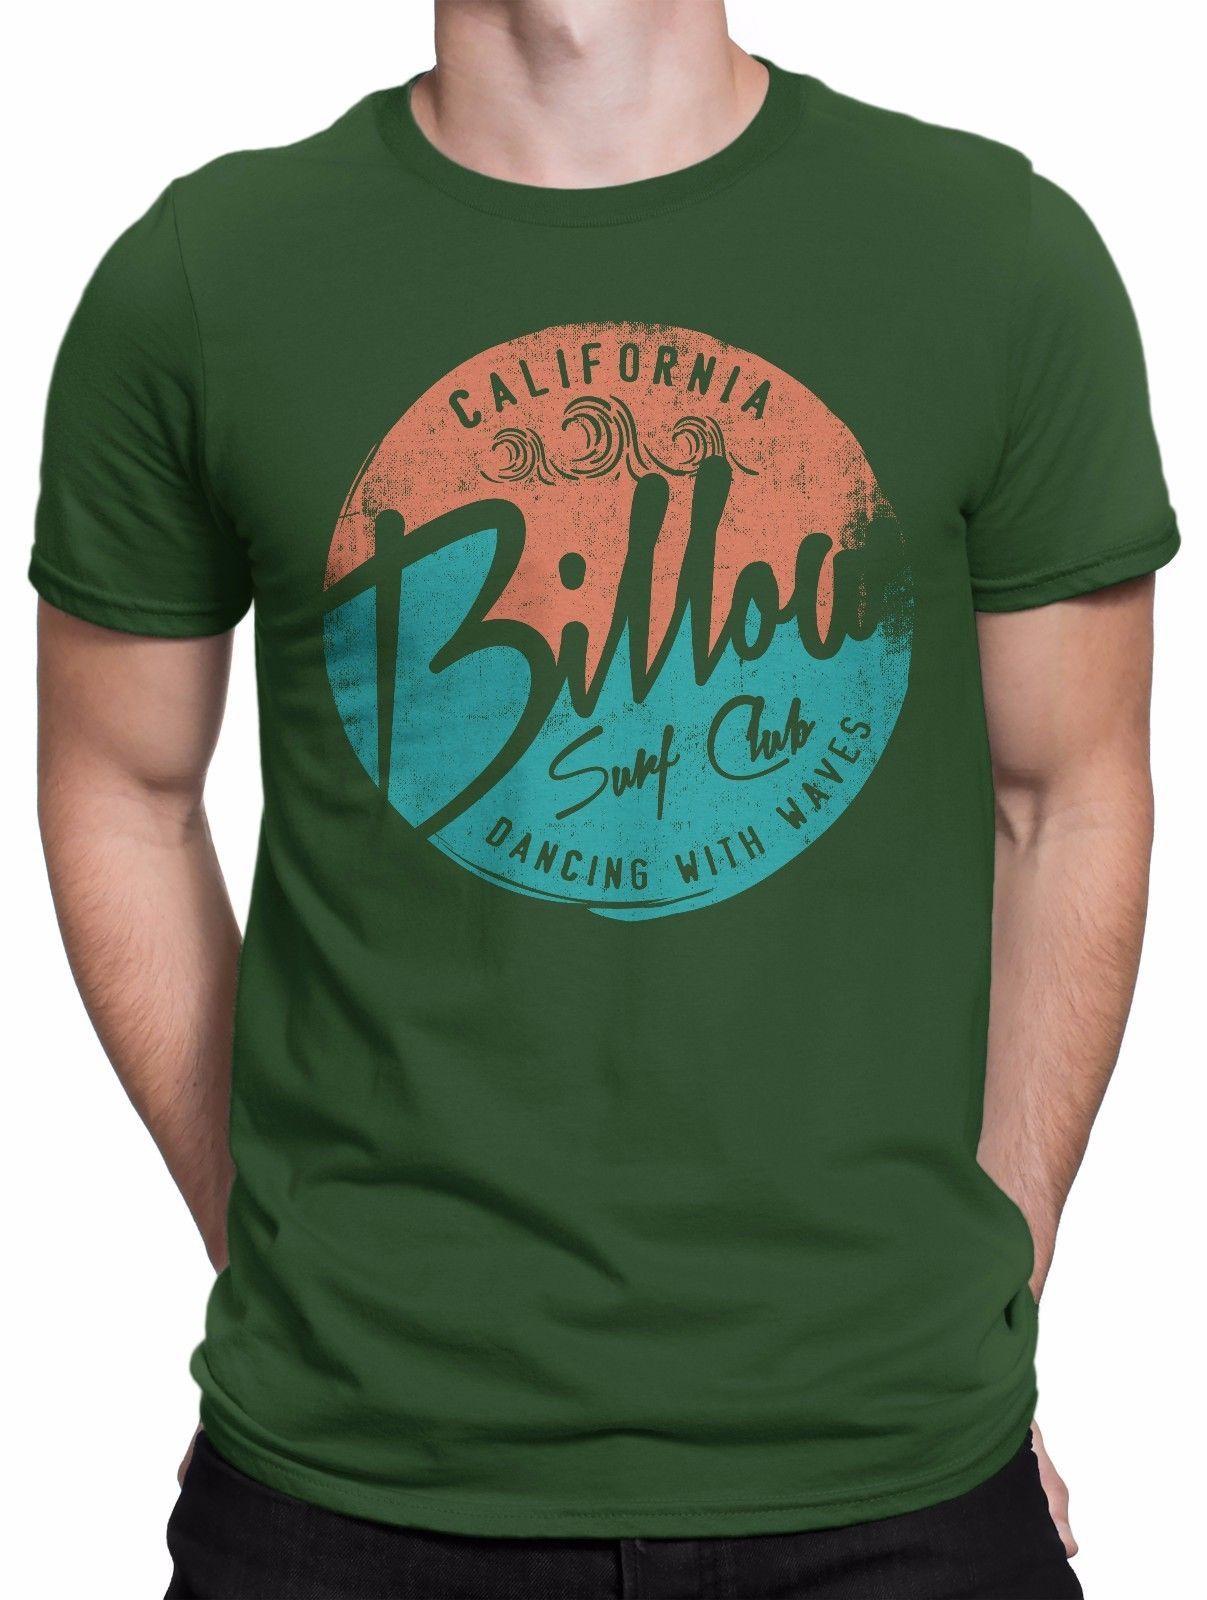 d62b58bdfd4 T SHIRT Uomo Billow Surf Club Maglietta 100% Cotone VERDE T Shirts Awesome  Funny Printed Shirts From Bstdhgate03, $11.01| DHgate.Com